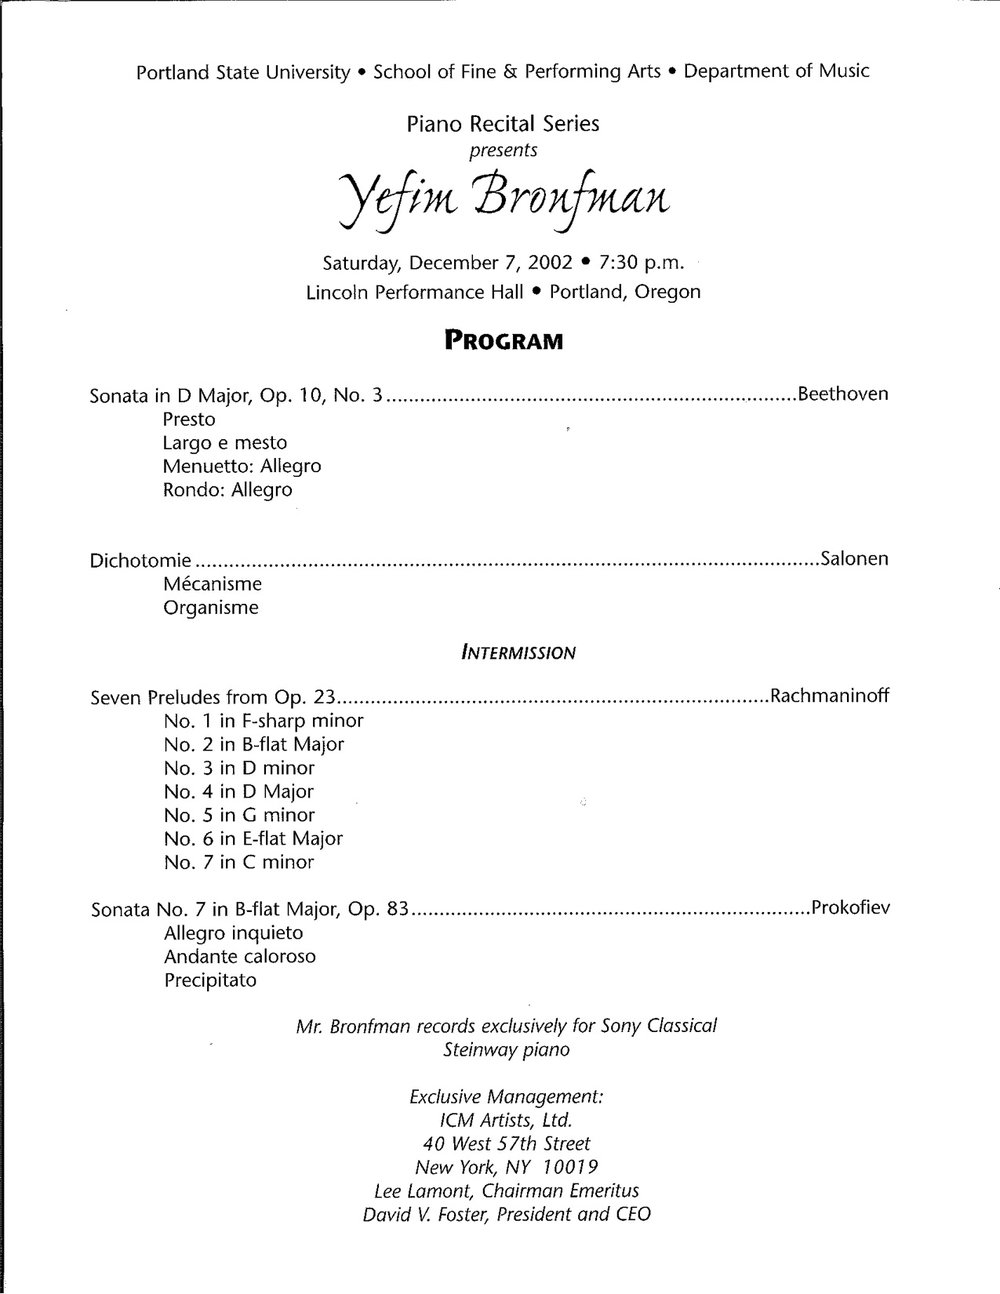 Bronfman02-03_Program2.jpg